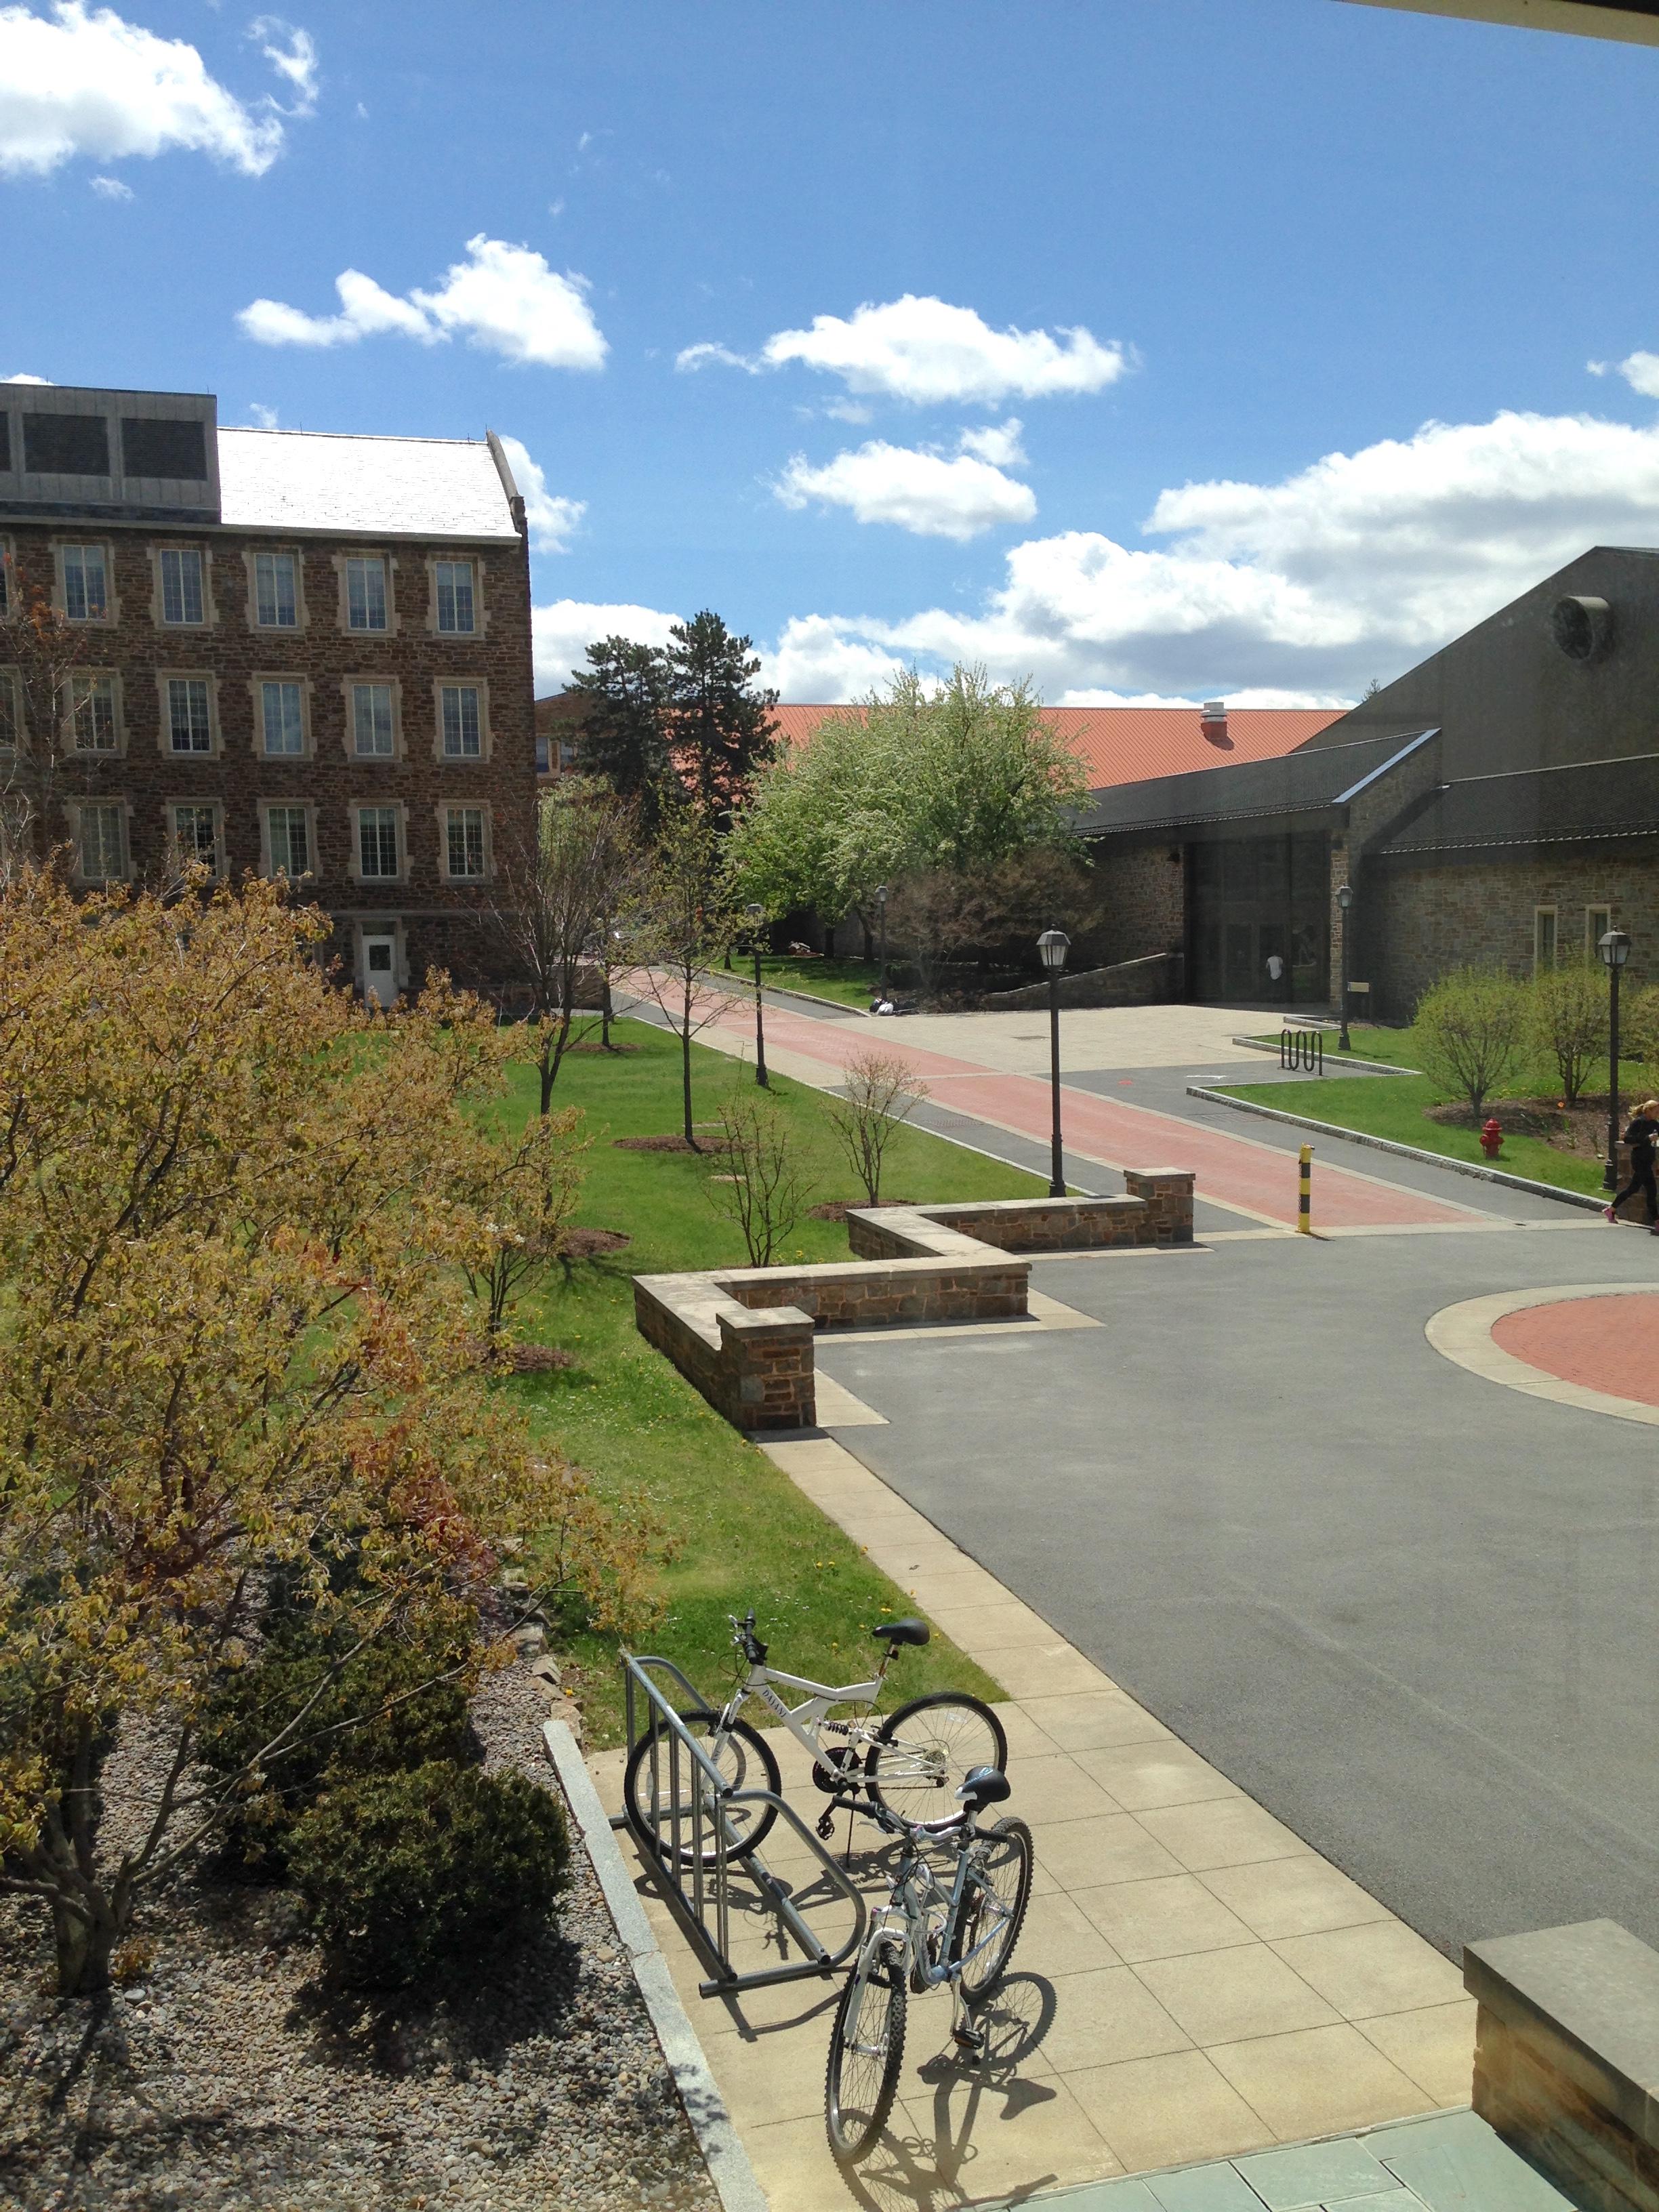 hamilton college—martin's way